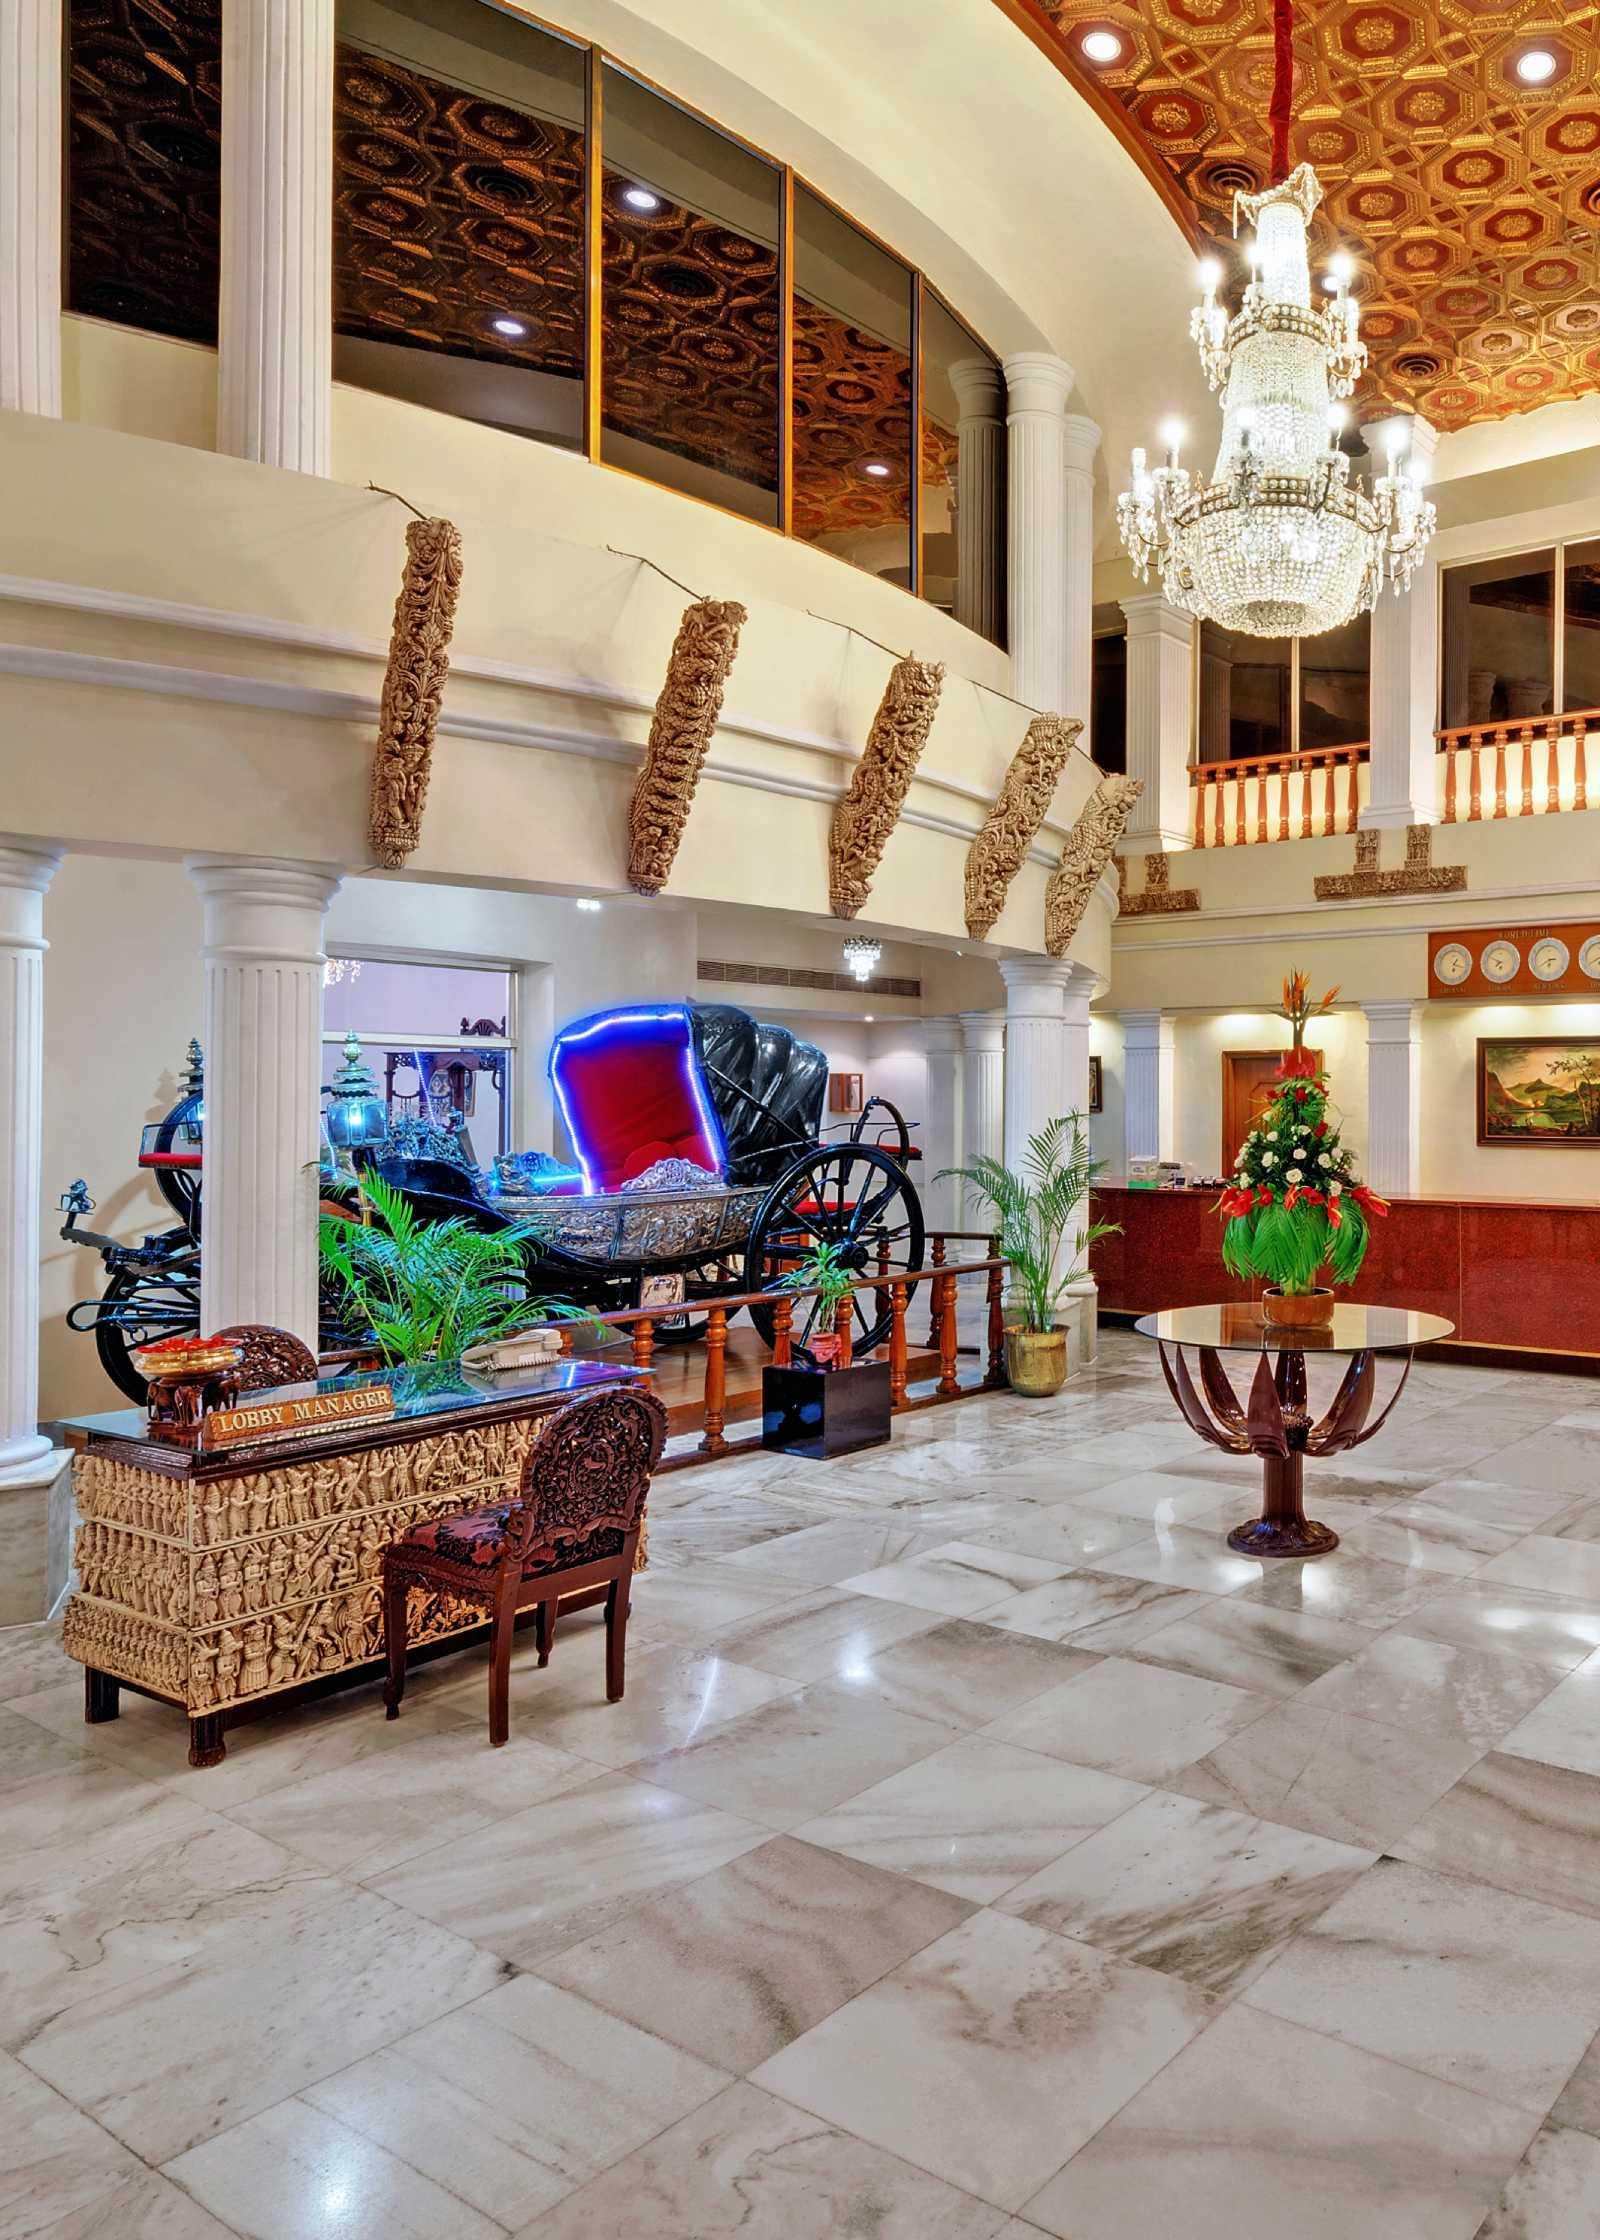 Lobby ambassador pallava chennai 2 - The Ambassador | Heritage Hotels in Mumbai, Aurangabad, Chennai - Ambassador Pallava Chennai